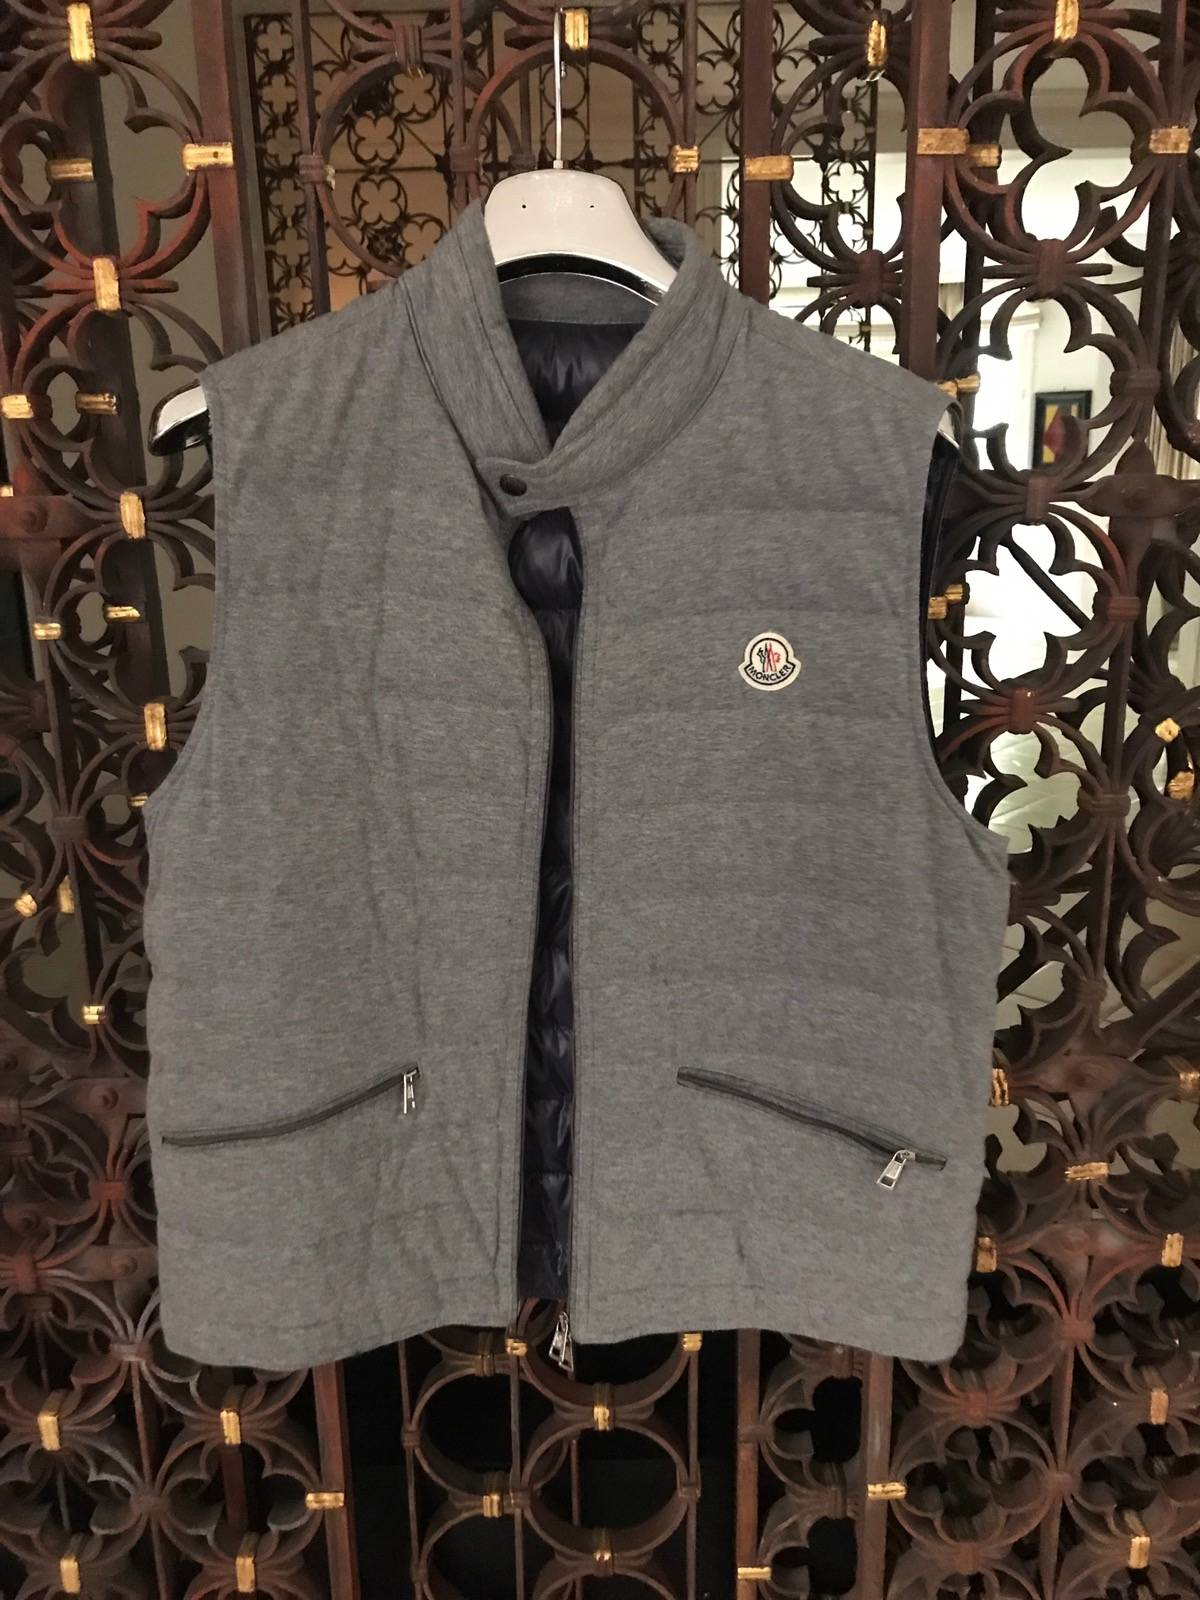 ef2ae3029 Moncler Gui Moncler Grey Size M $218